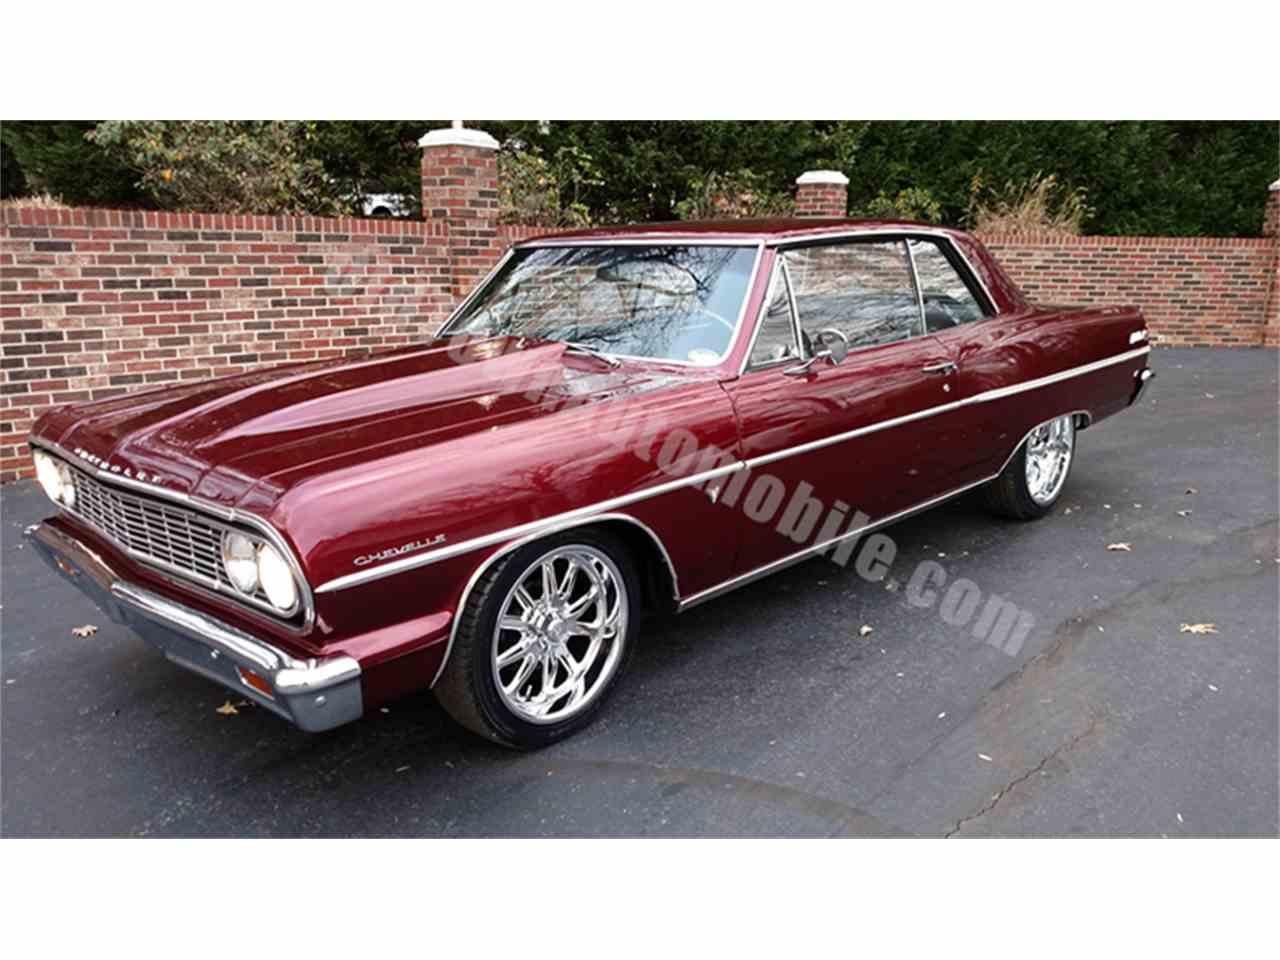 1964 Chevrolet Chevelle for Sale | ClassicCars.com | CC-1075511